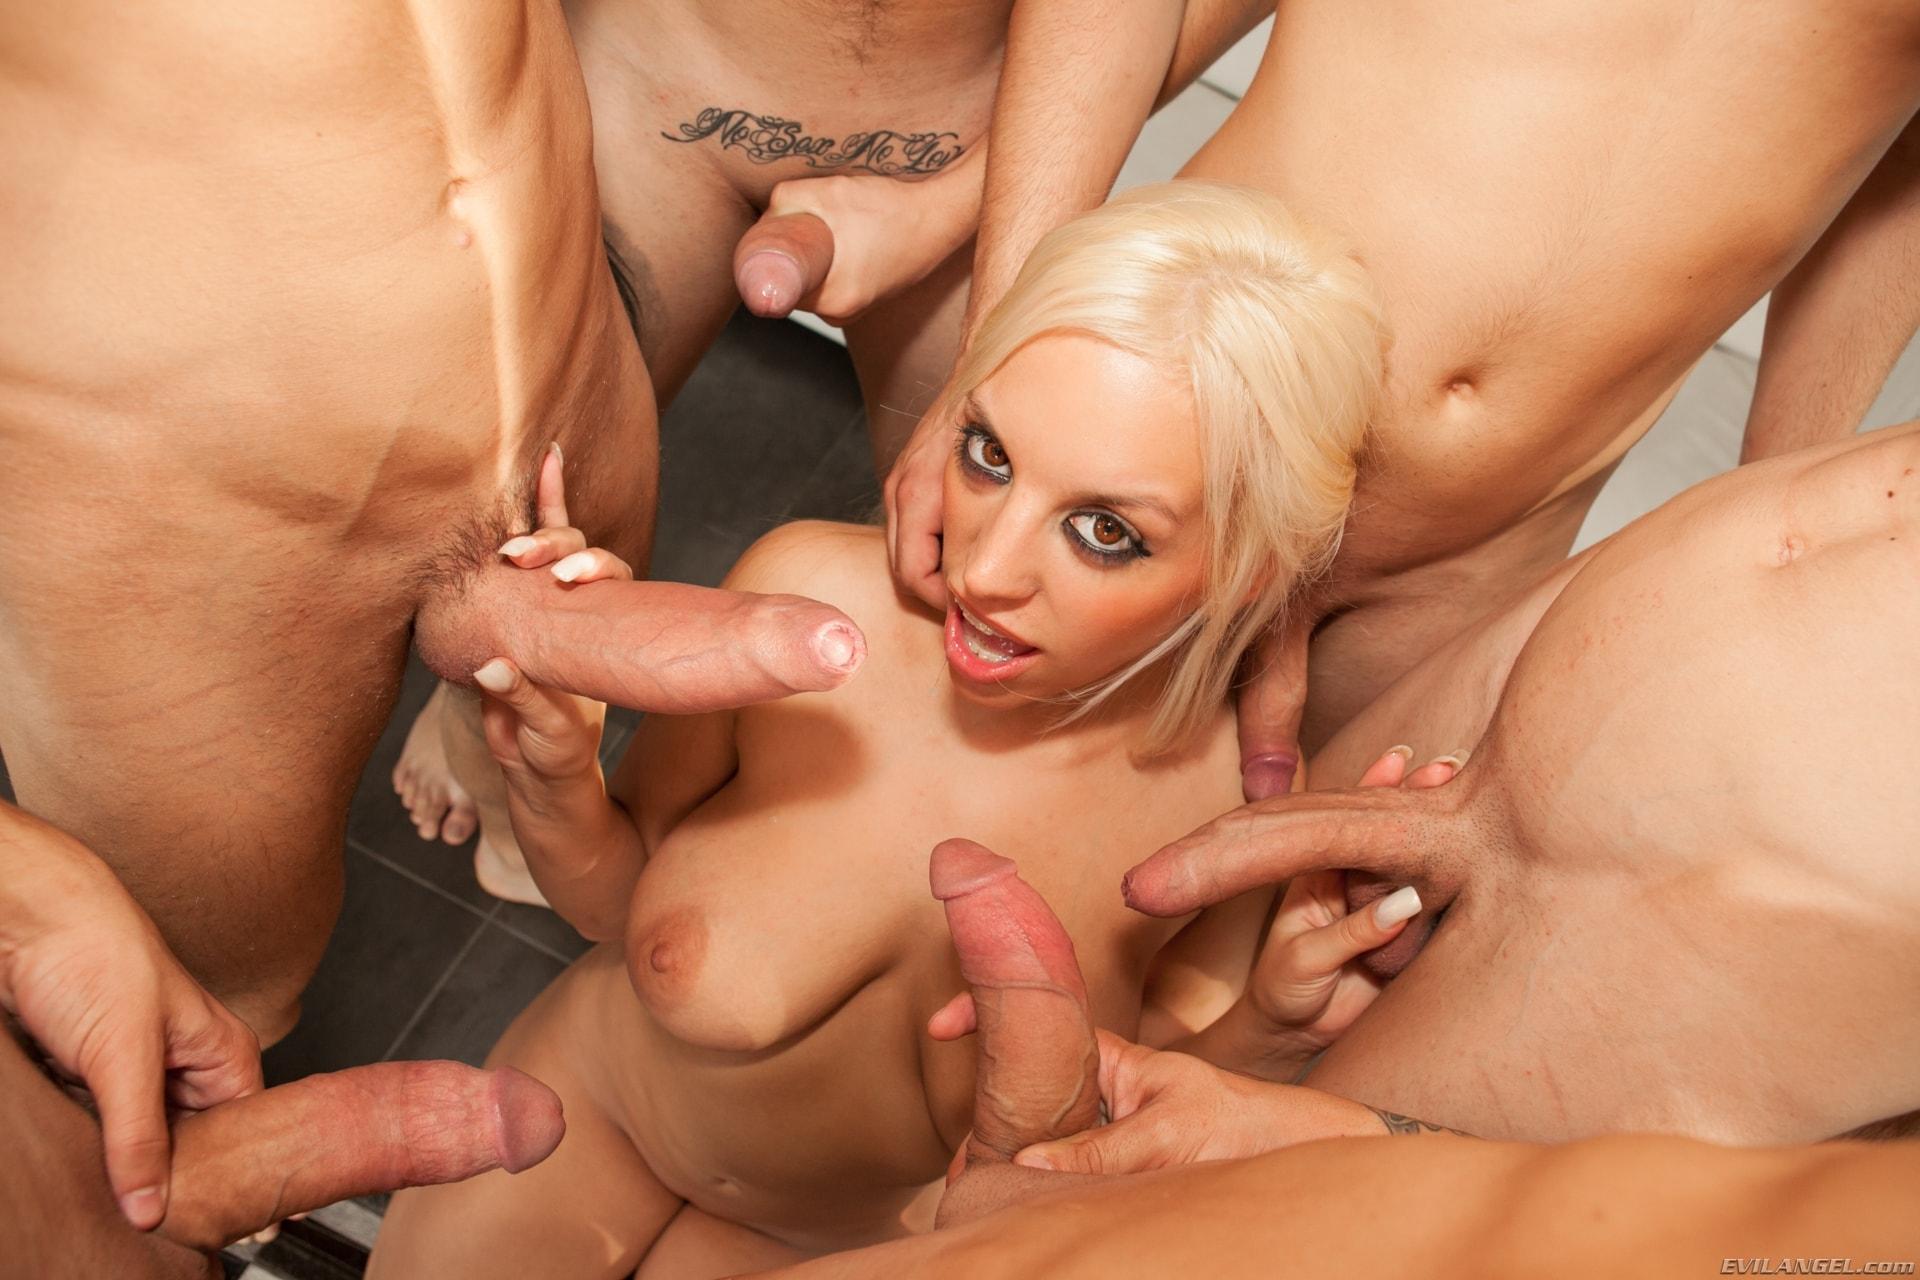 Evil Angel 'Nacho's Fucking Amateurs 02: Gangbangs' starring Blondie Fesser (Photo 2)